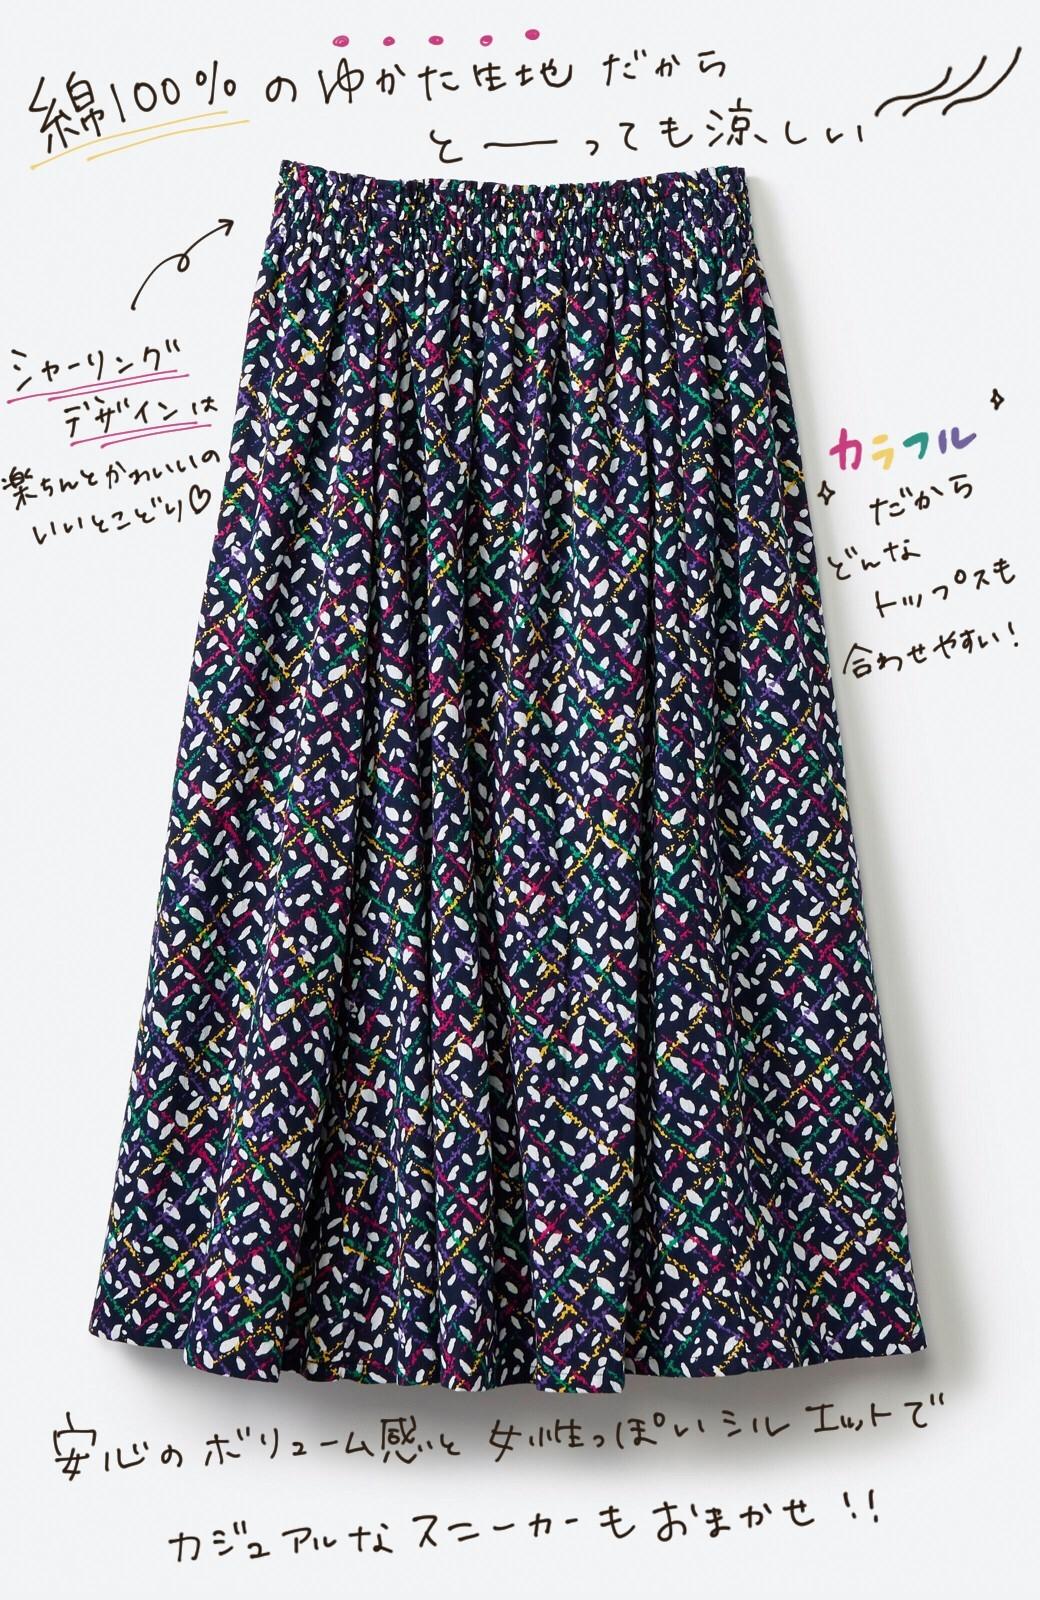 haco! 【コラボ3年目!】京都の浴衣屋さんと作った浴衣生地のスカート <ネイビー>の商品写真1